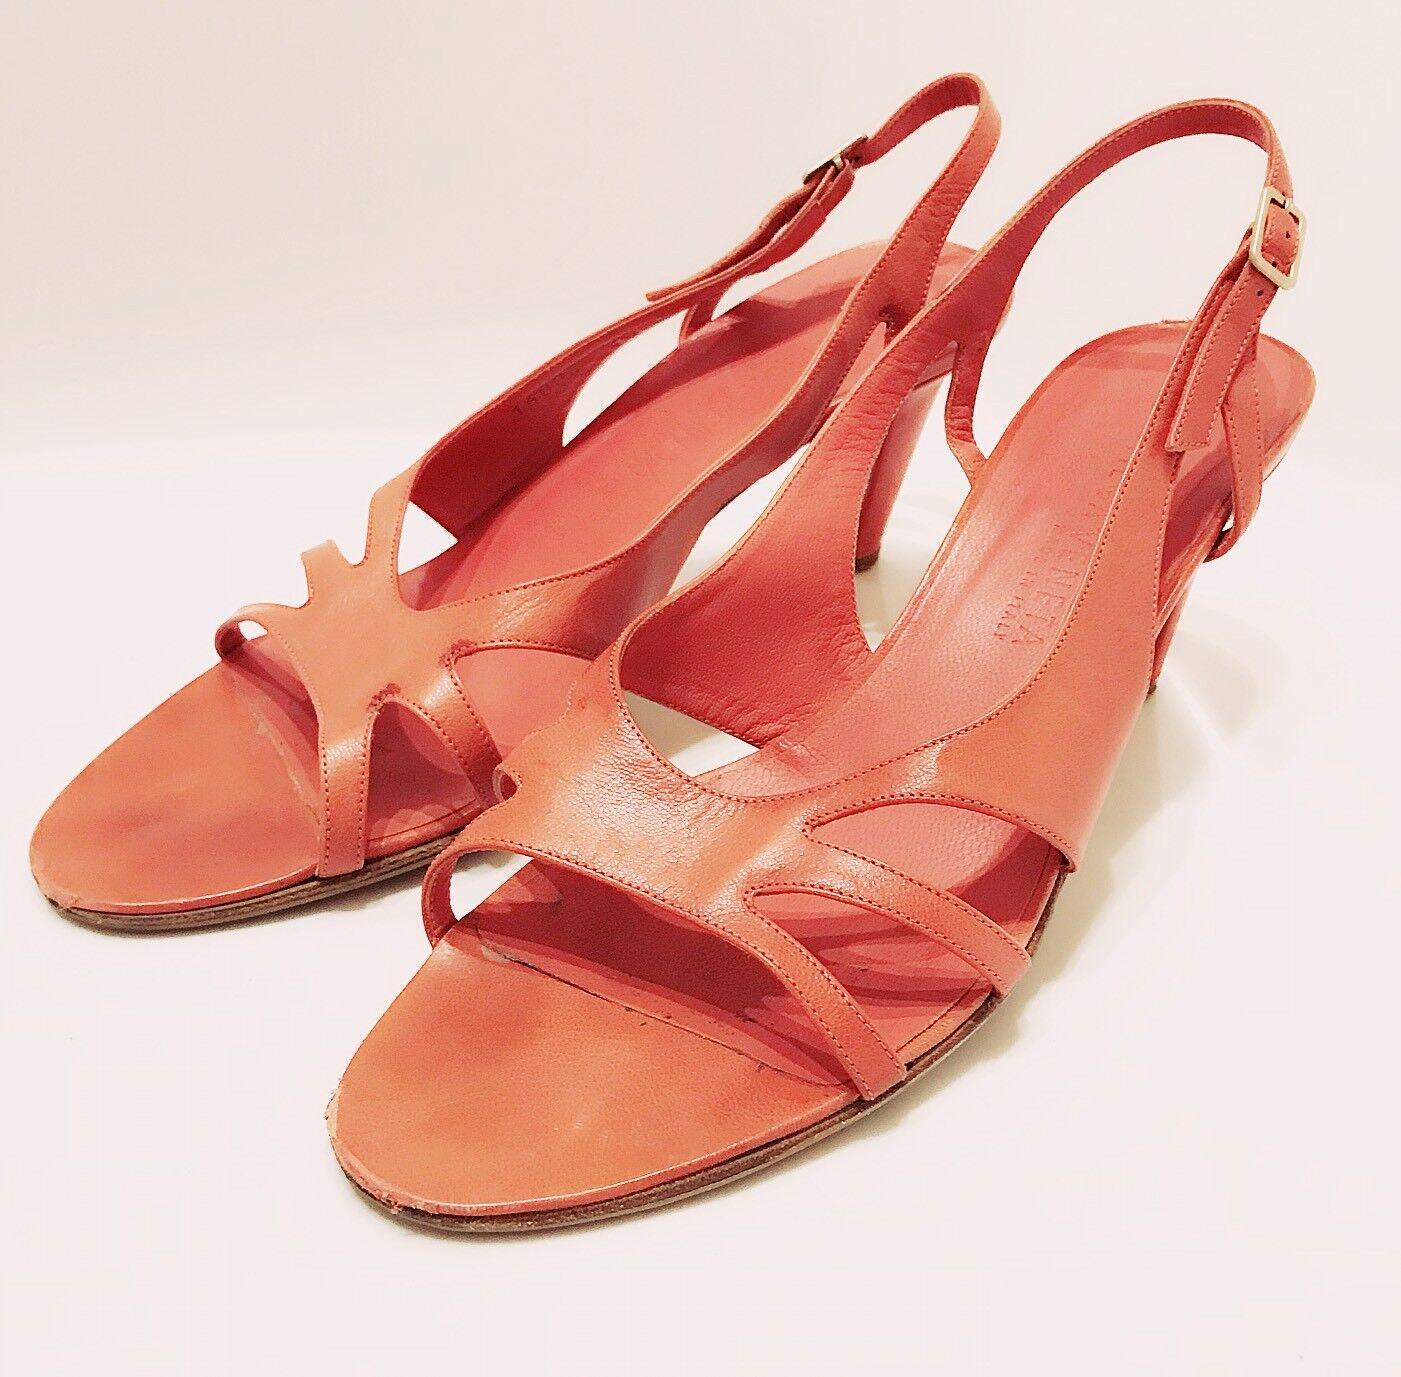 BOTTEGA Heel VENETA Coral Red Pelle Stencil Cut Out High Heel BOTTEGA Slingback Sandals 8.5 d802f1